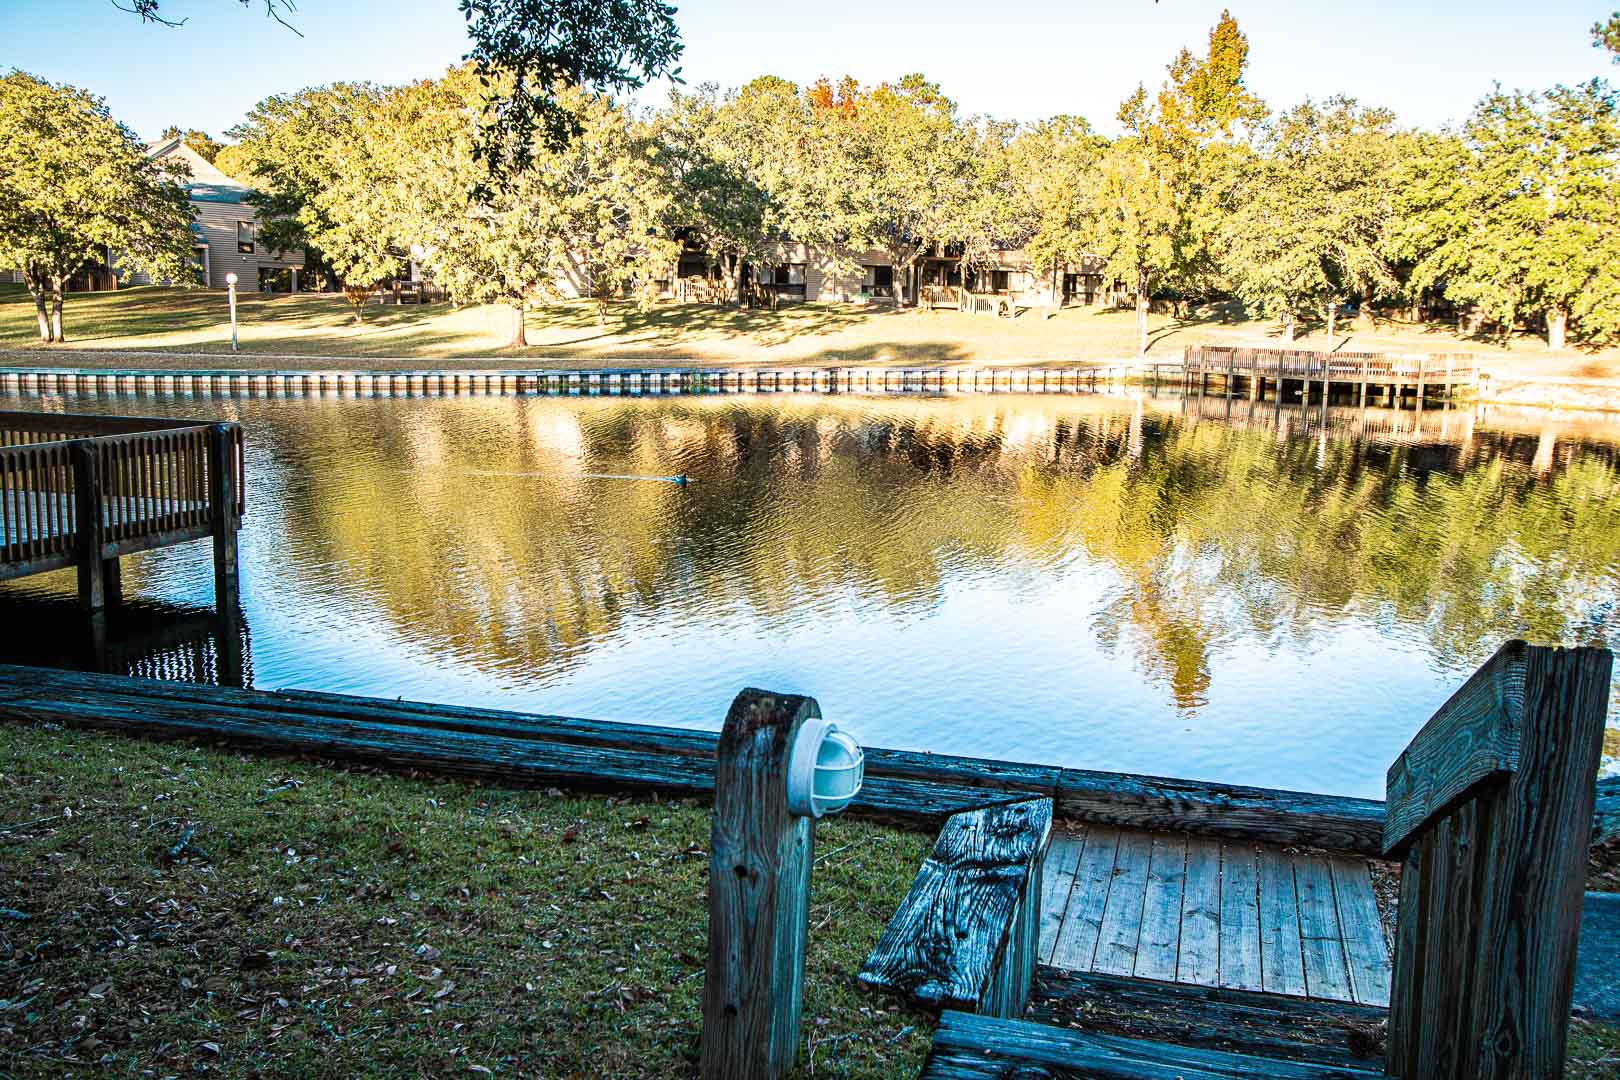 A scenic view from the lake at VRI's Sandcastle Village in New Bern, North Carolina.